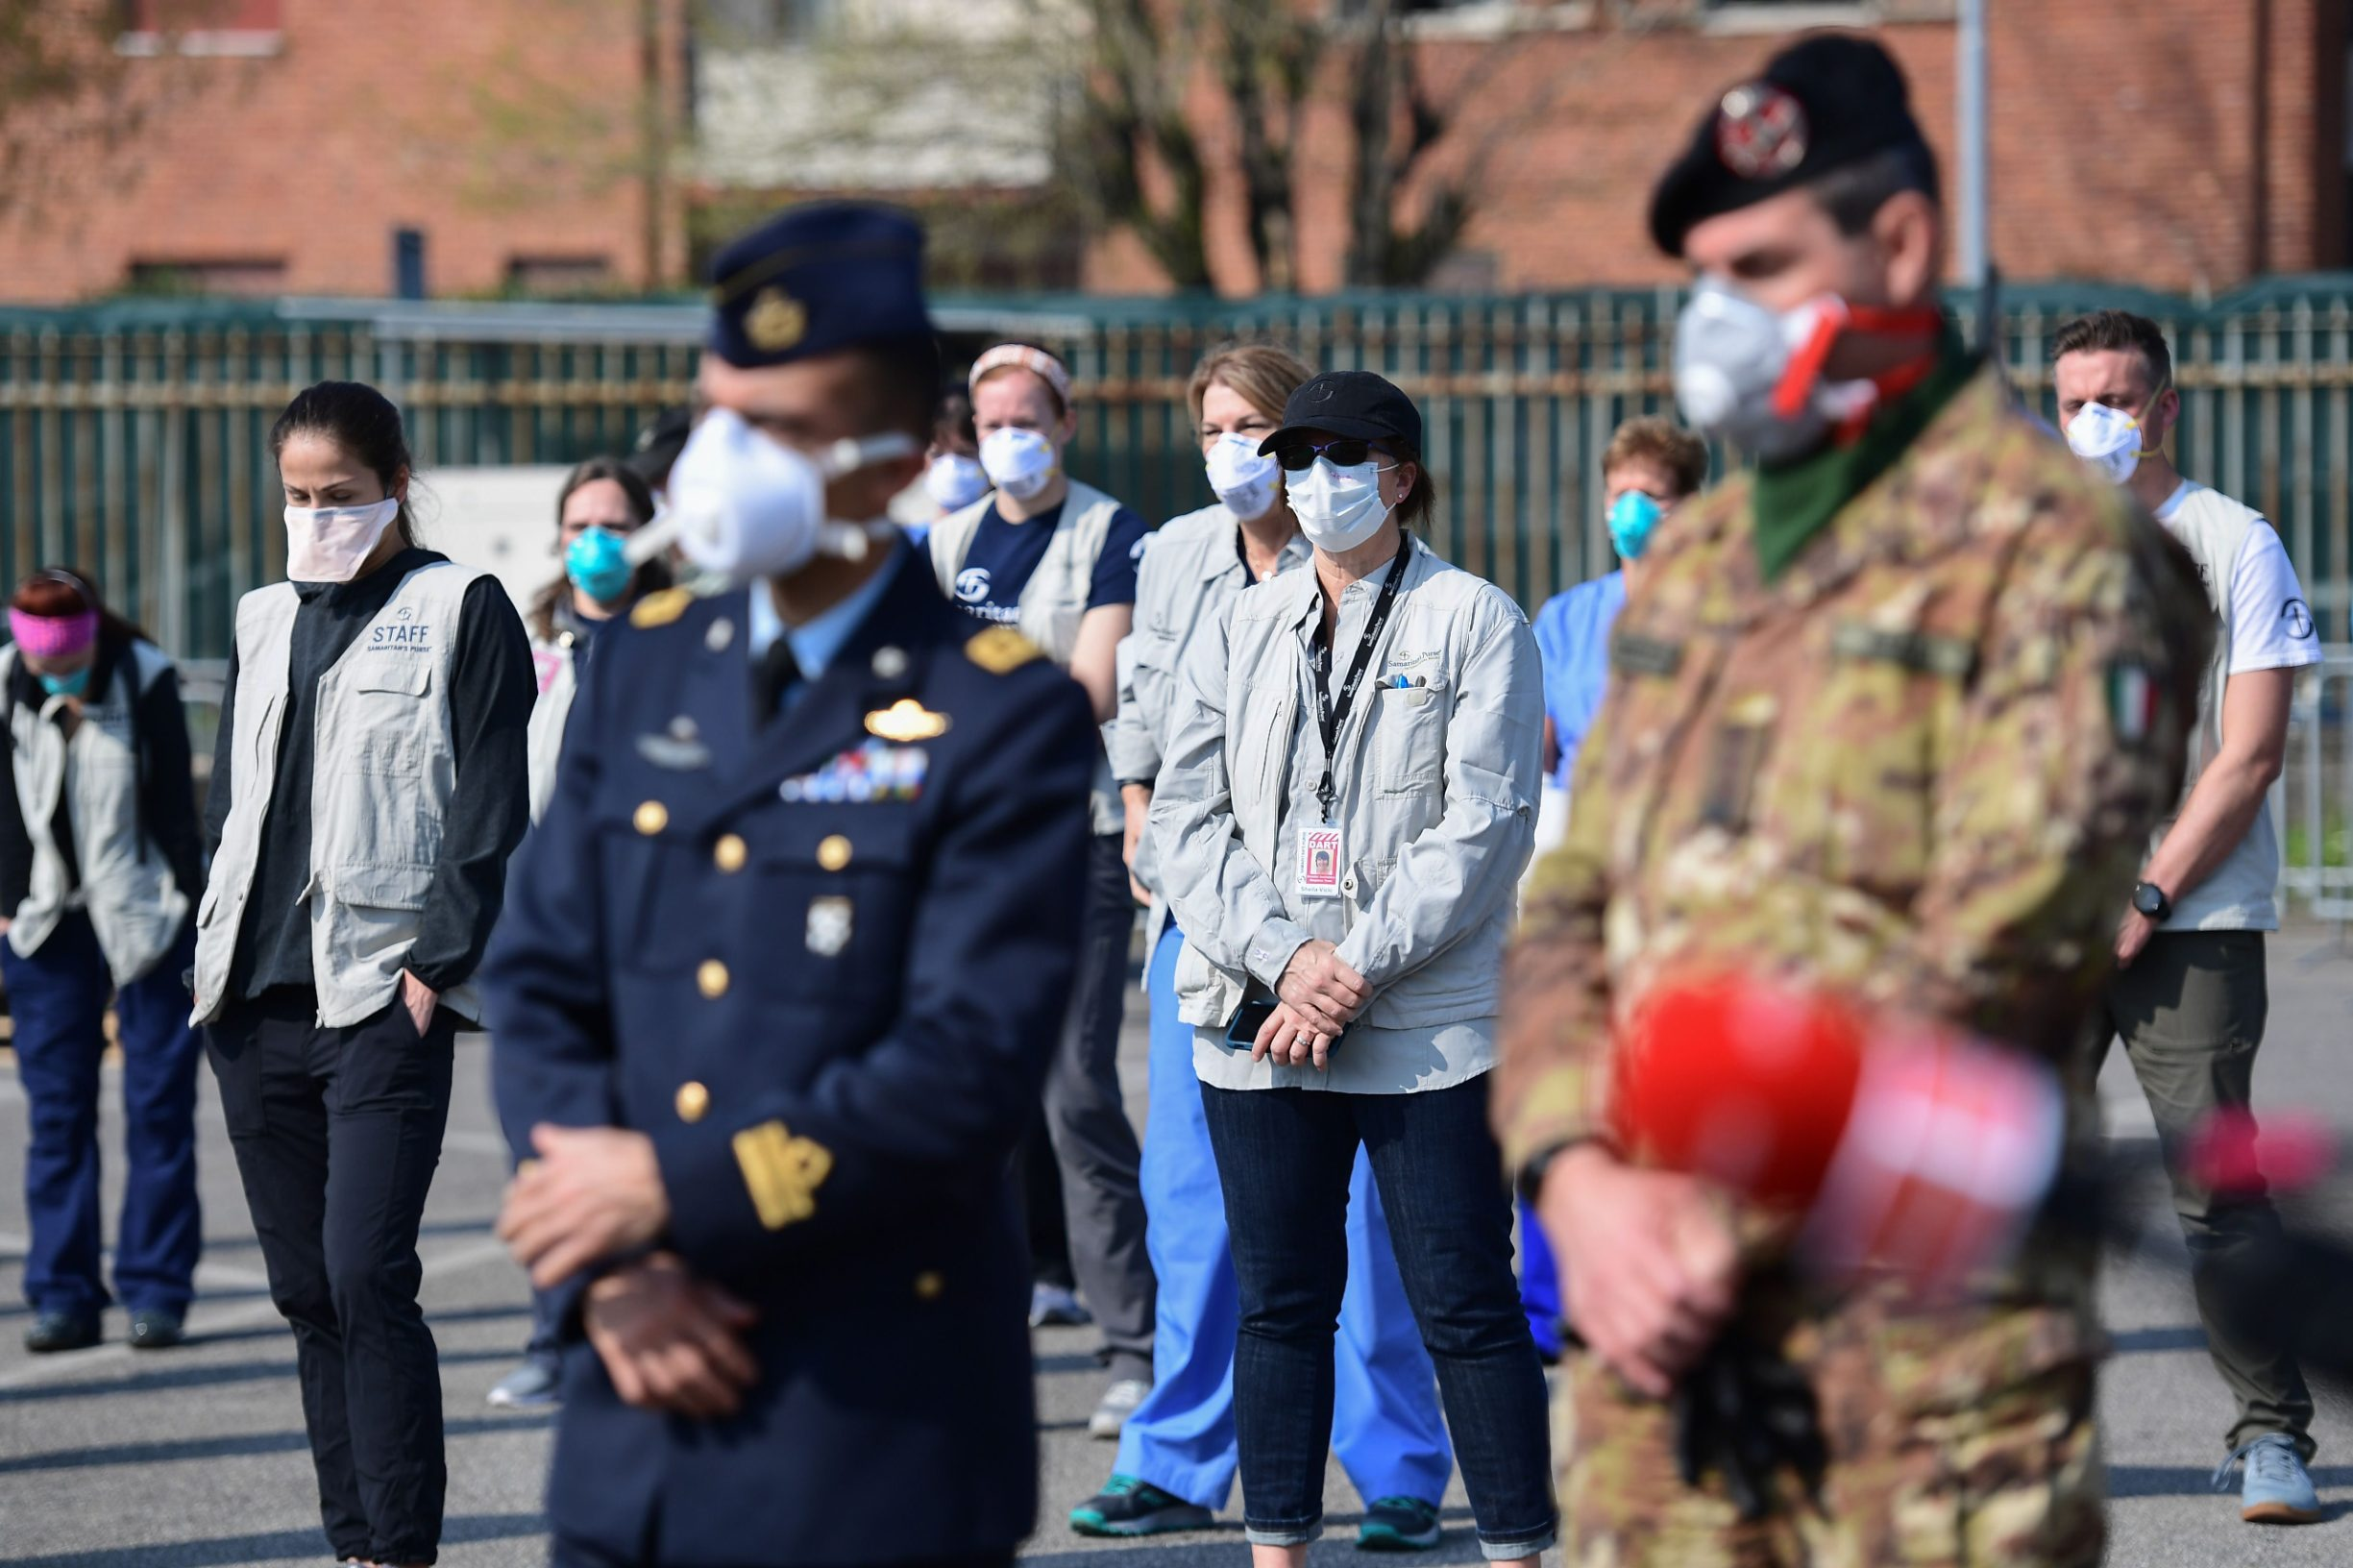 Vojska, medicinsko osoblje i volonteri